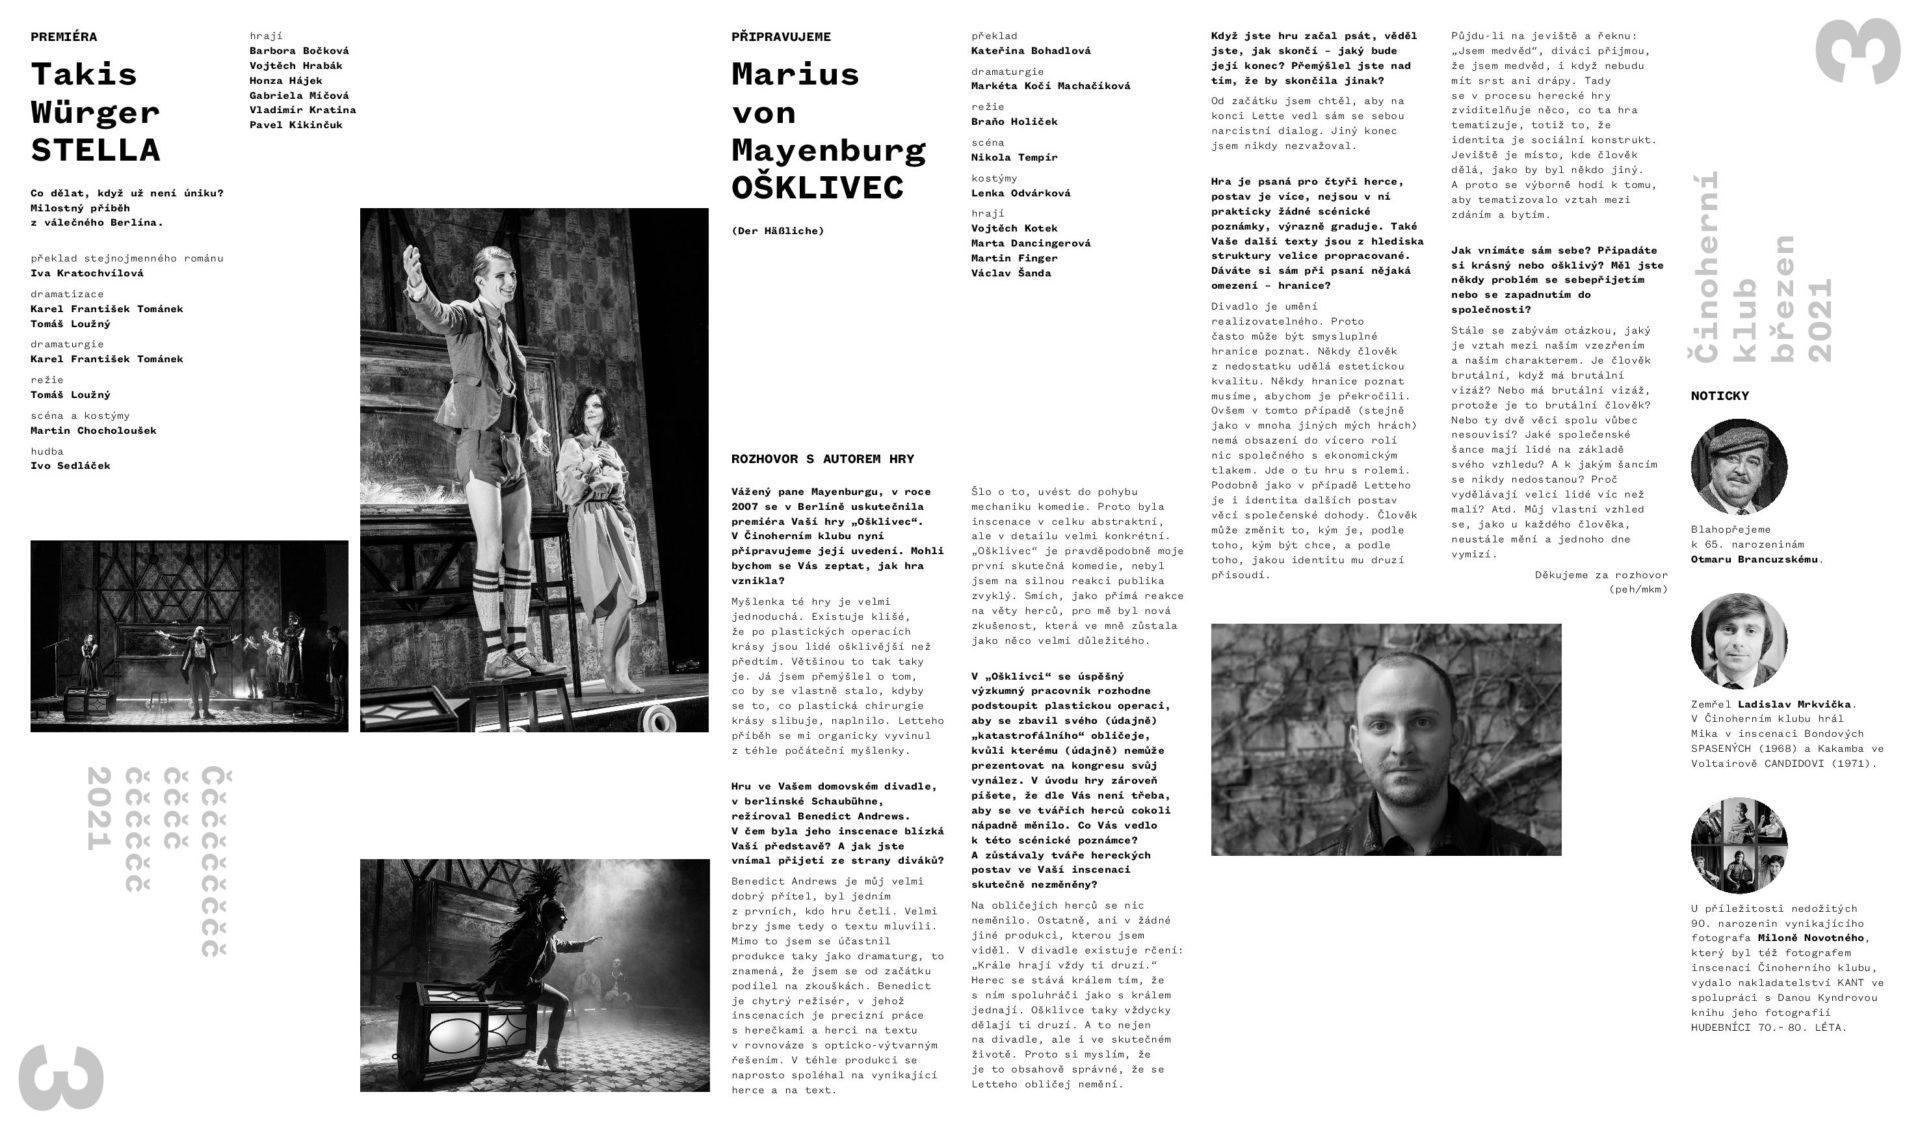 210201 Program brezen-page-004.